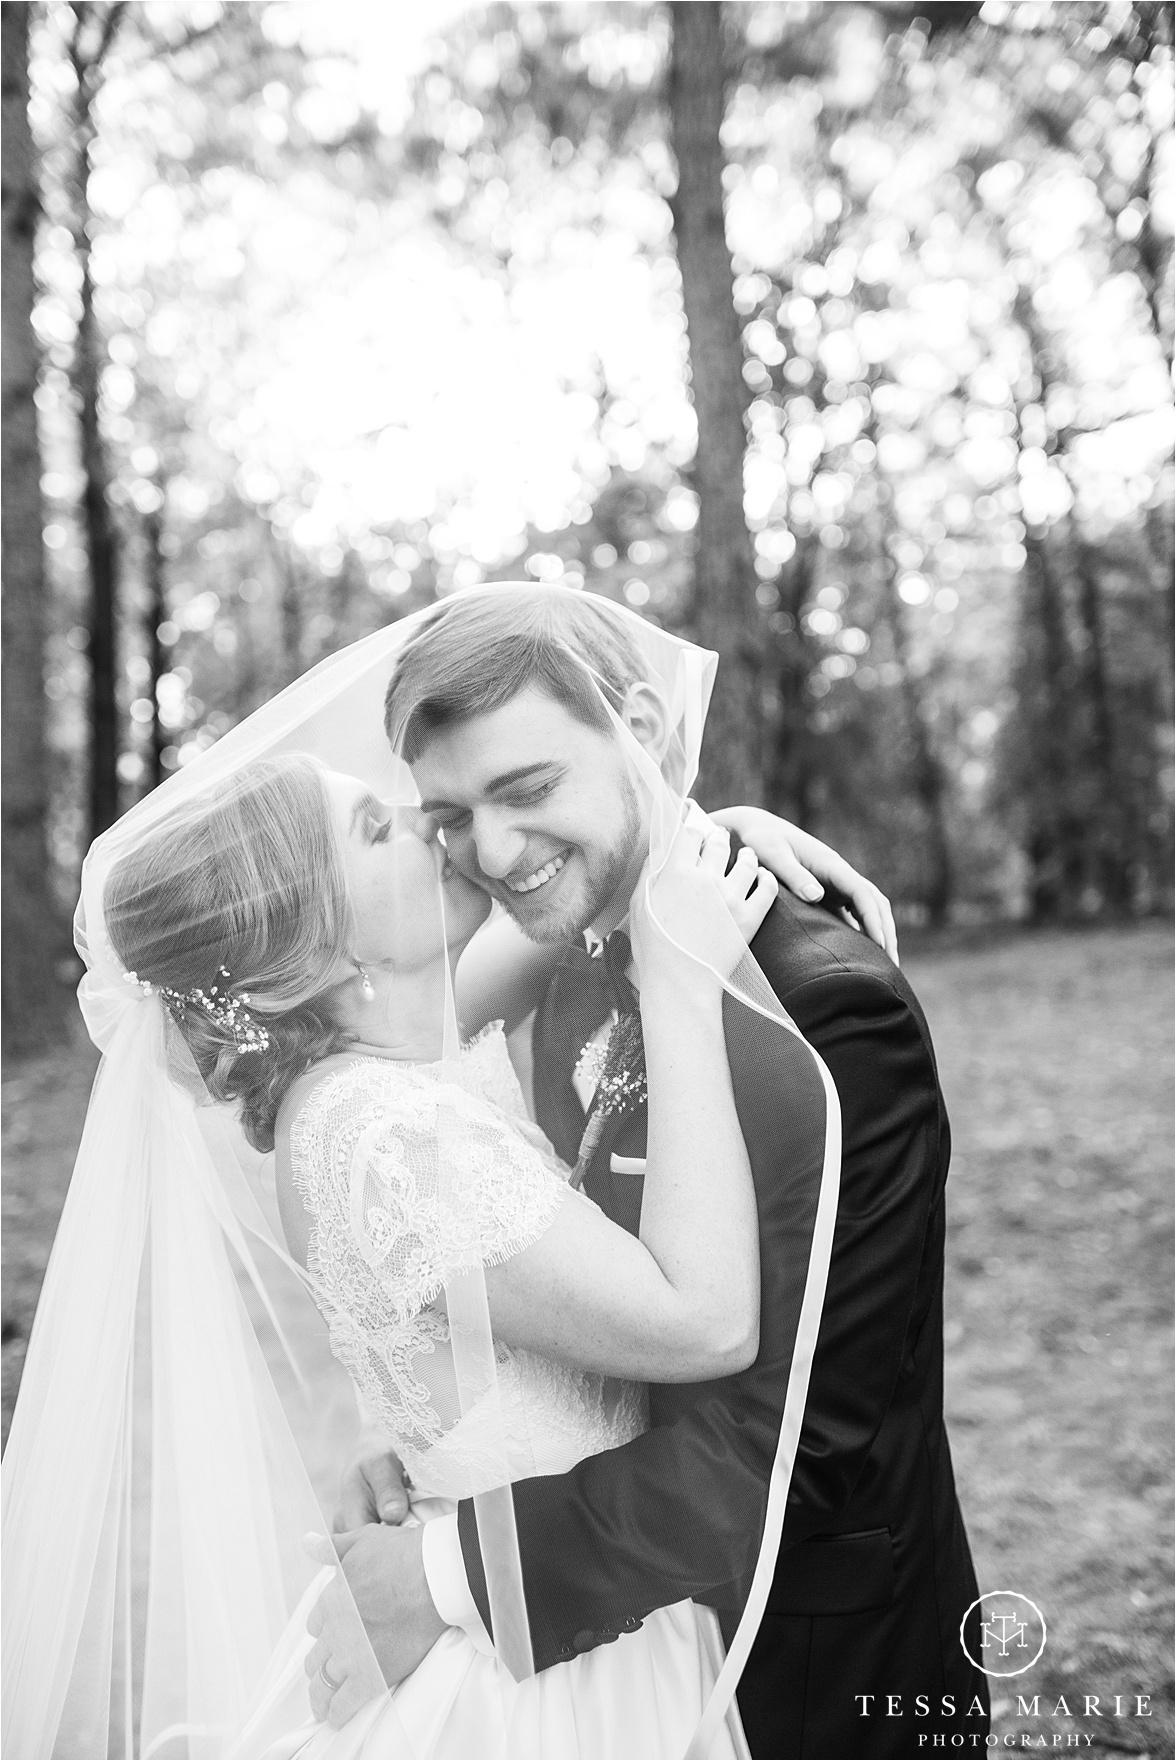 Tessa_marie_weddings_columbus_wedding_photographer_wedding_day_spring_outdoor_wedding_0128.jpg